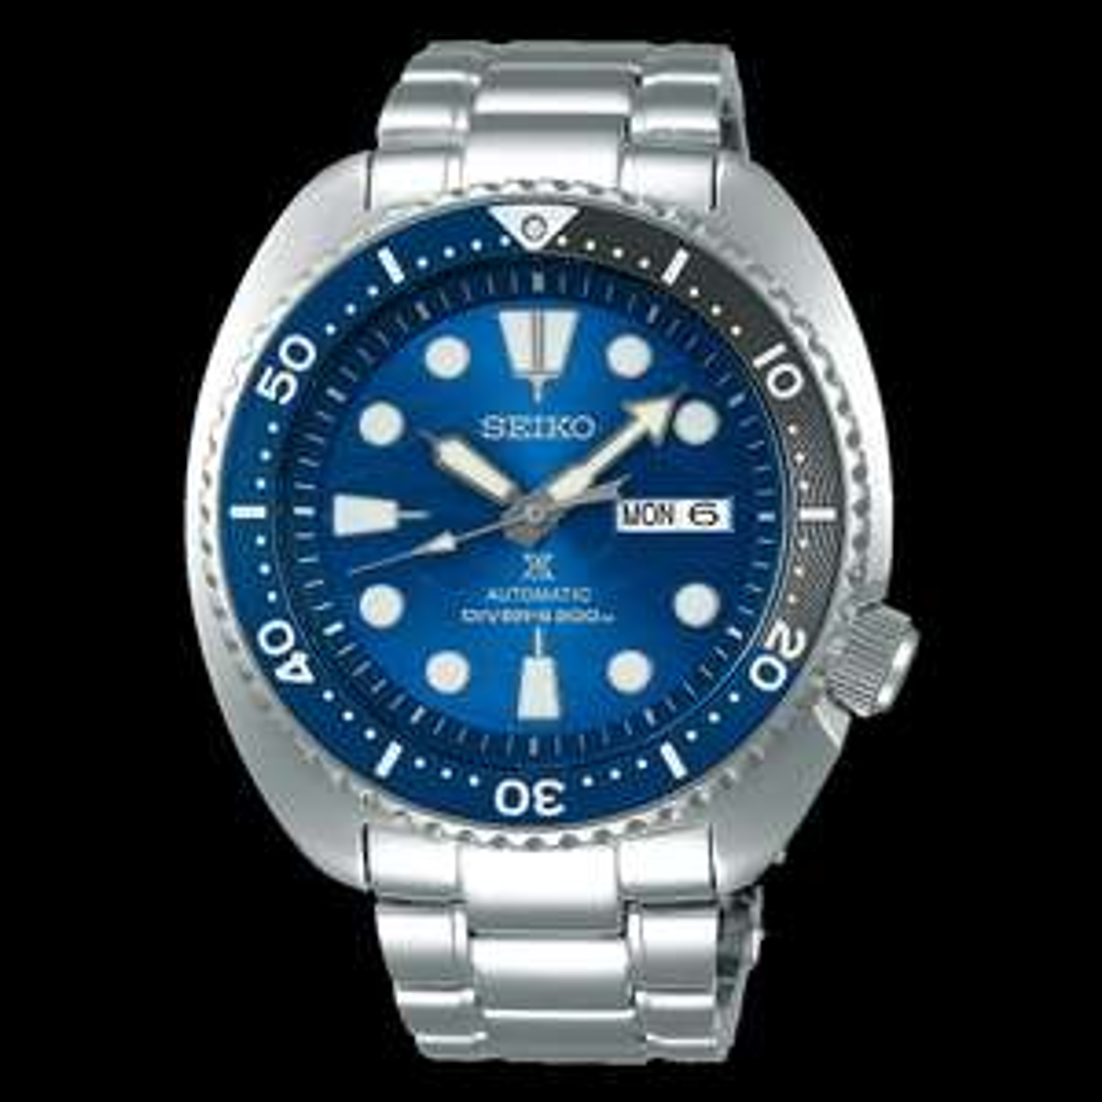 Men's Seiko Prospex Save The Ocean Turtle Automatic Watch - £301 @ H. Samuel